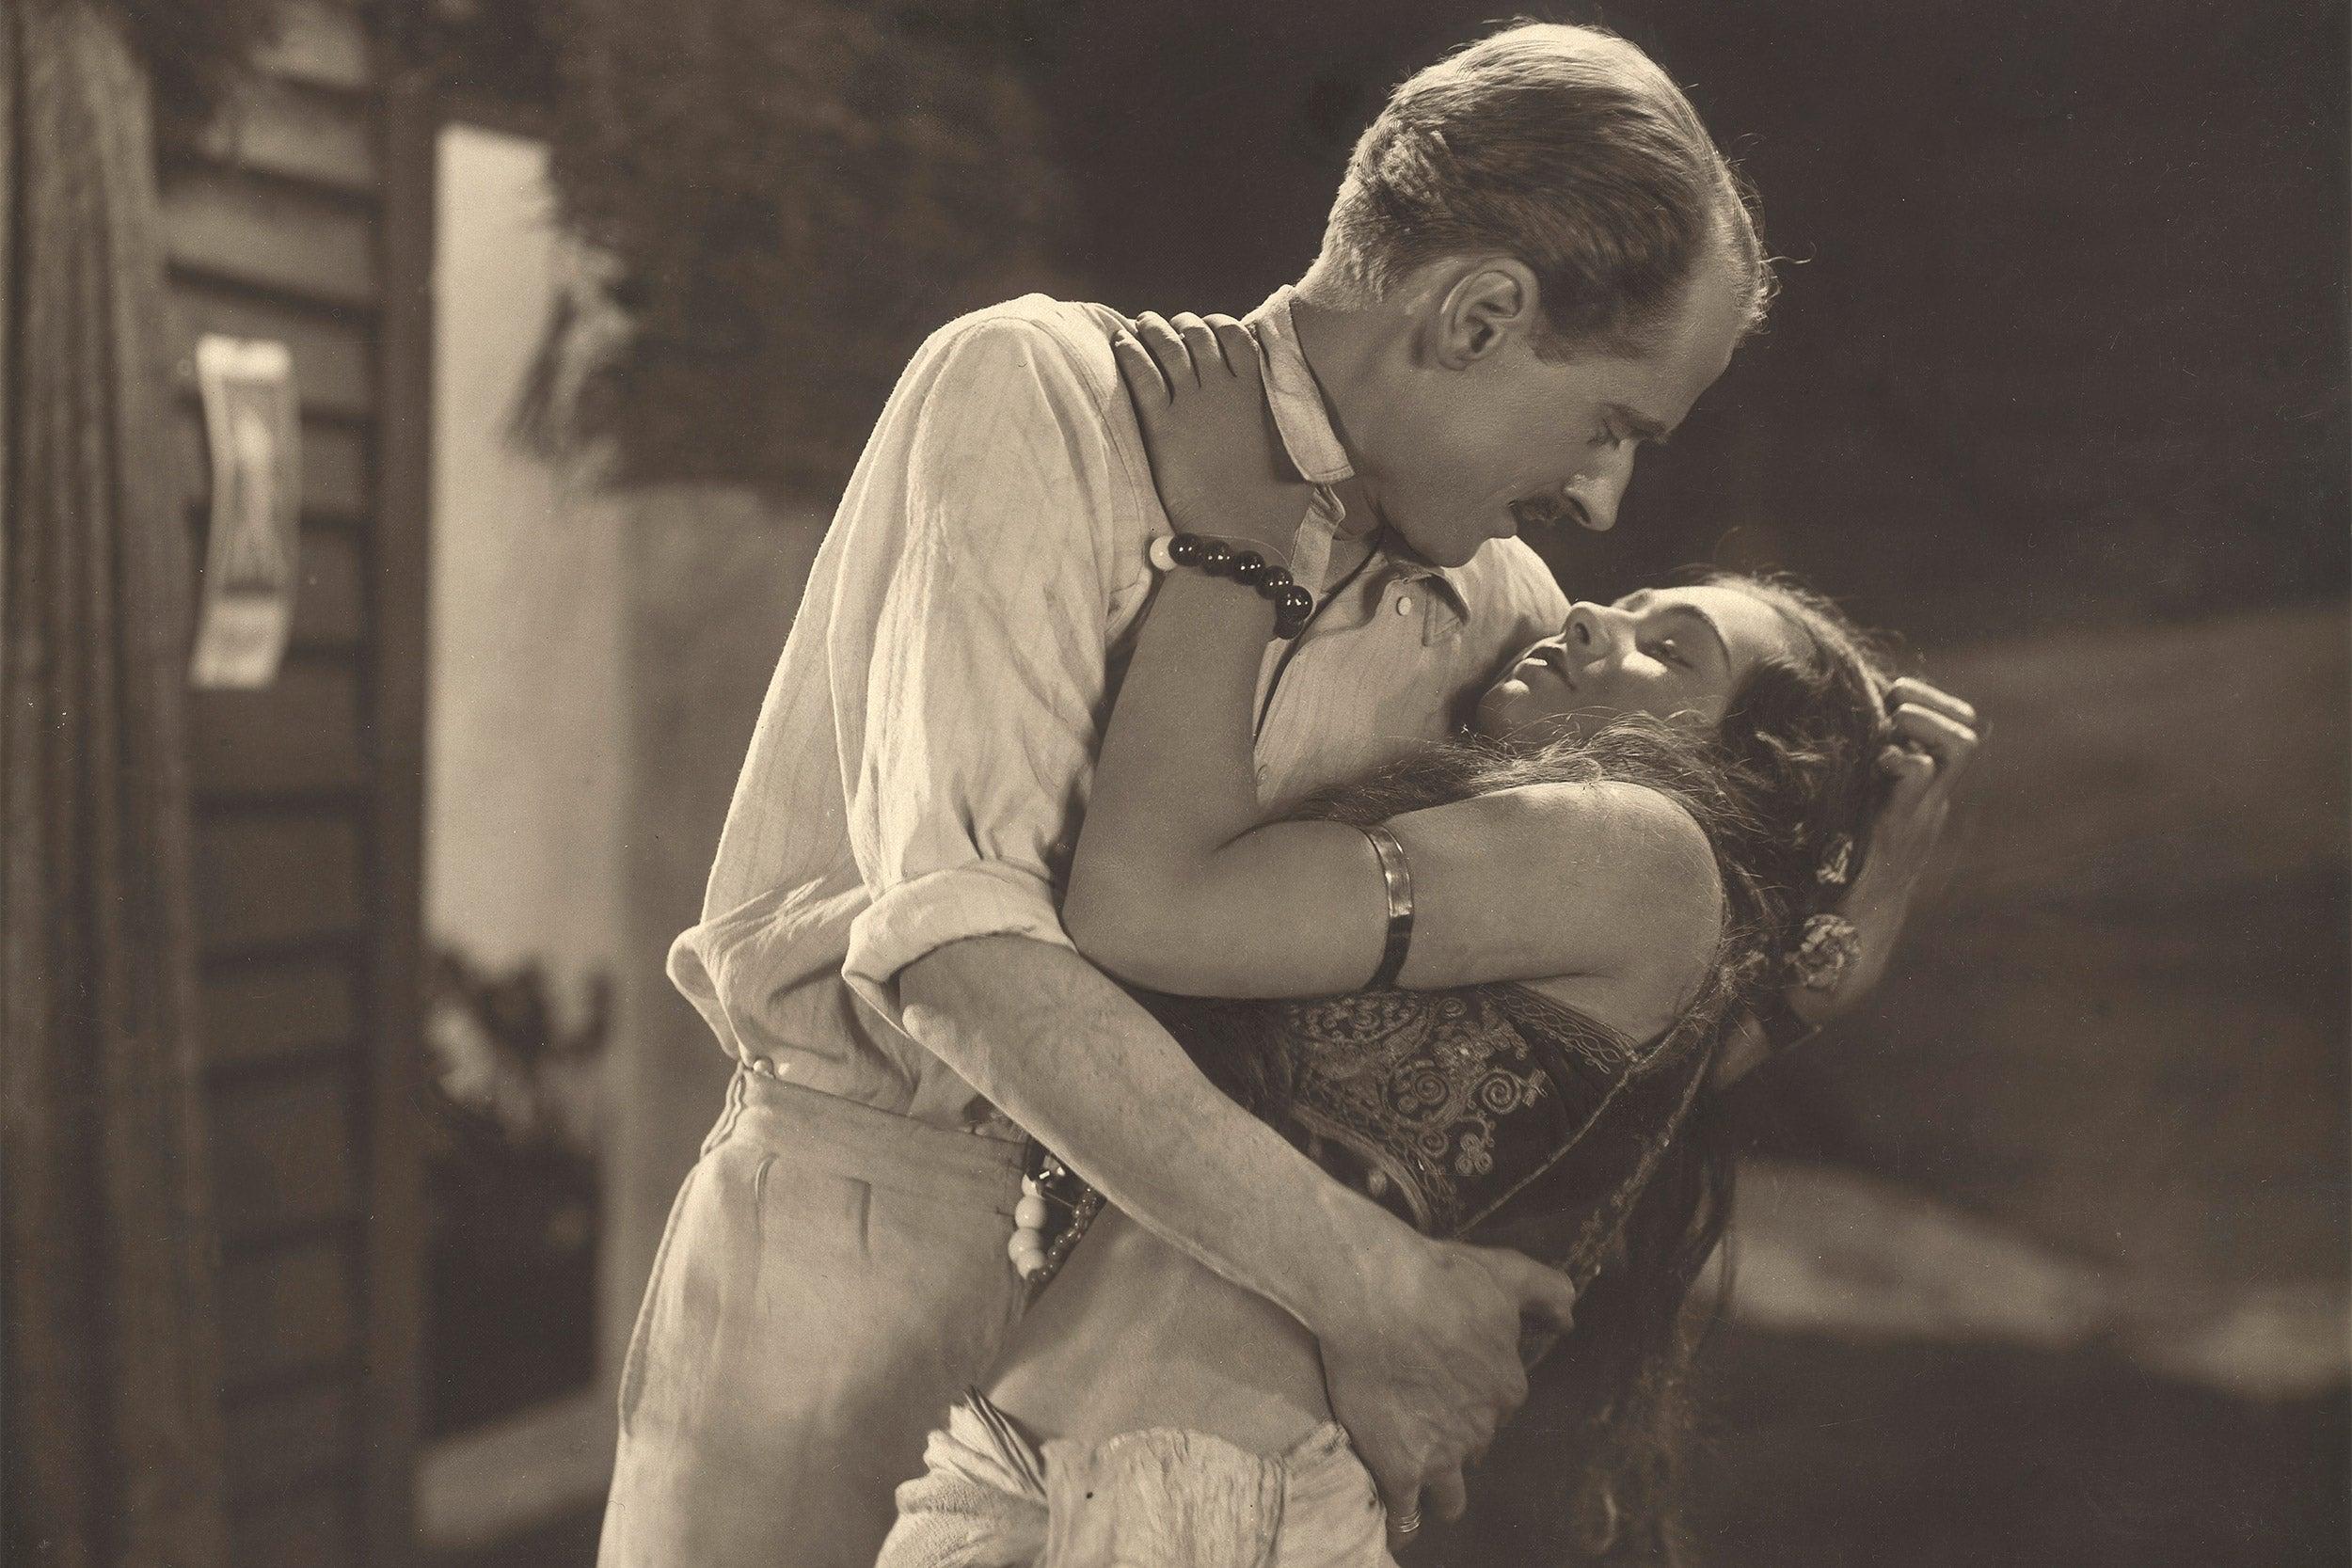 Harvard Film Archive to screen Hitchcock's silent-era films